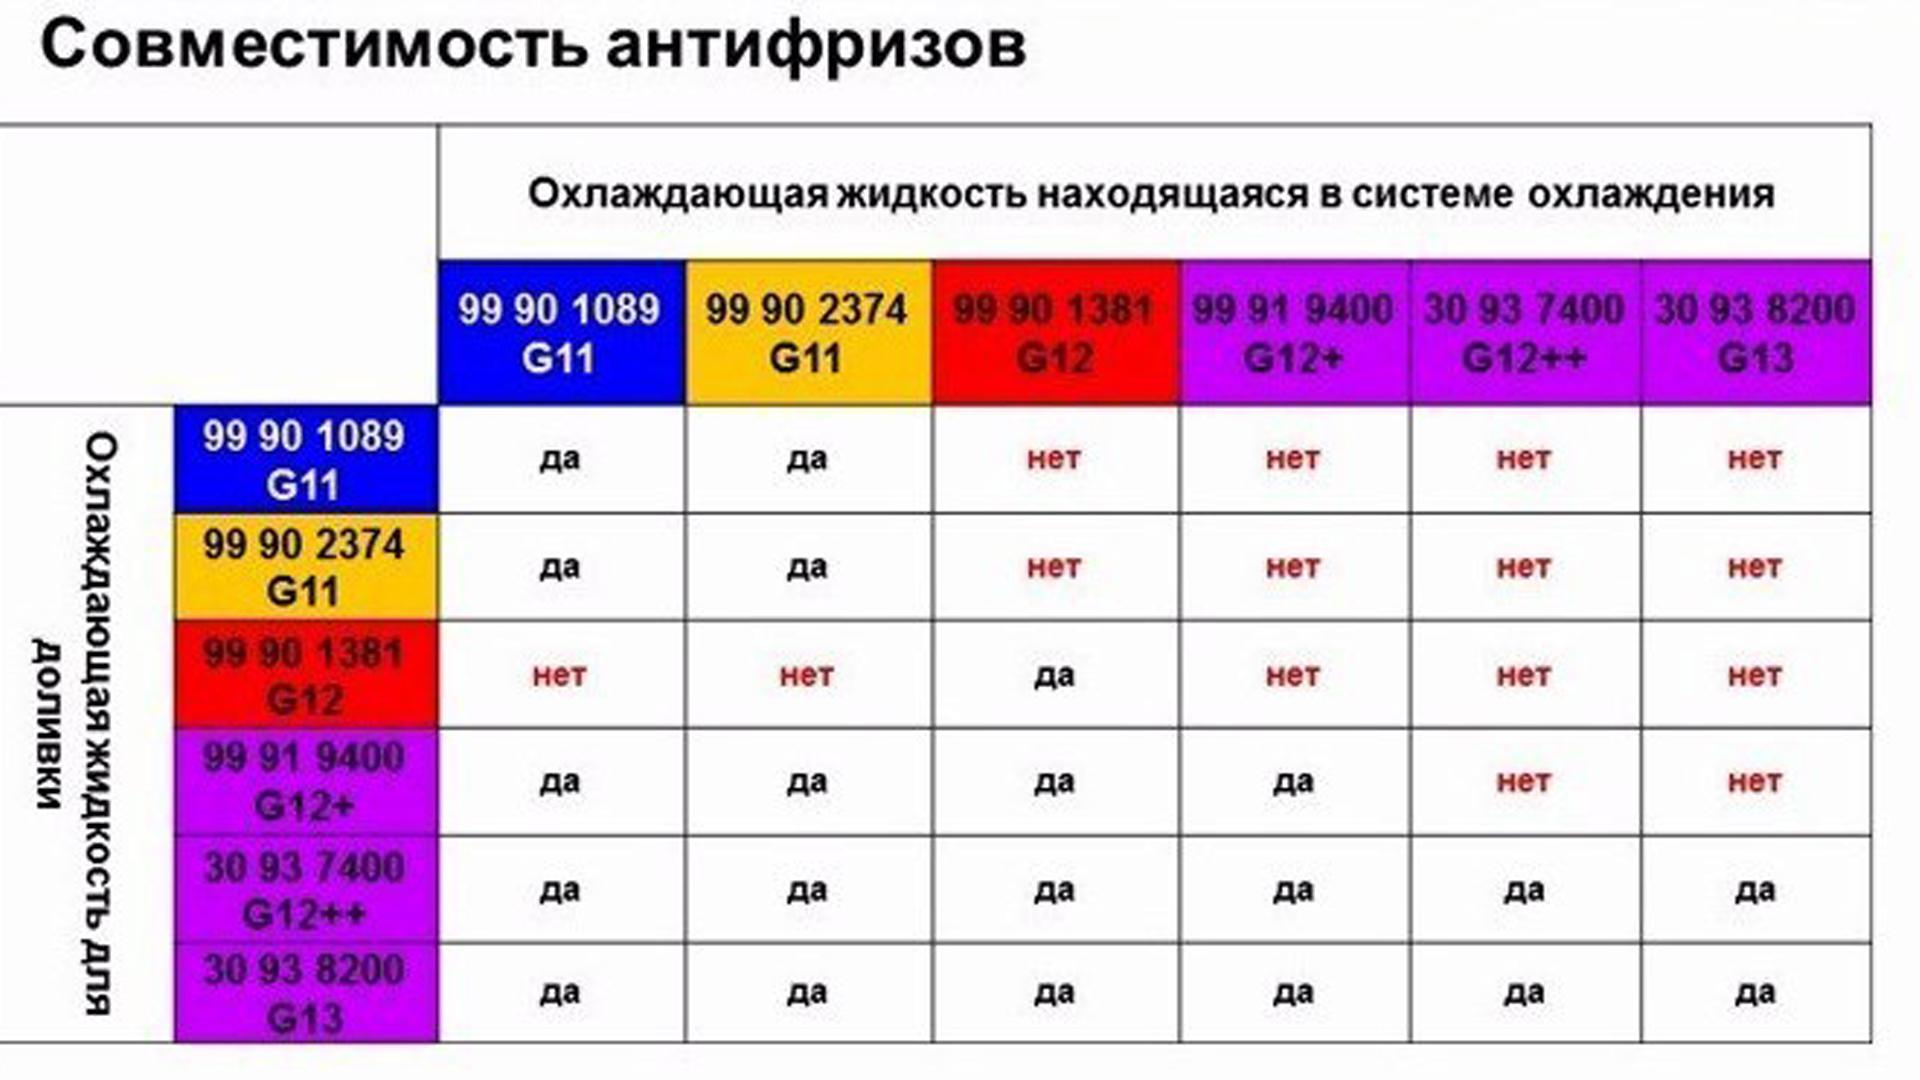 Таблица совместимости антифризов джи 11,12,13